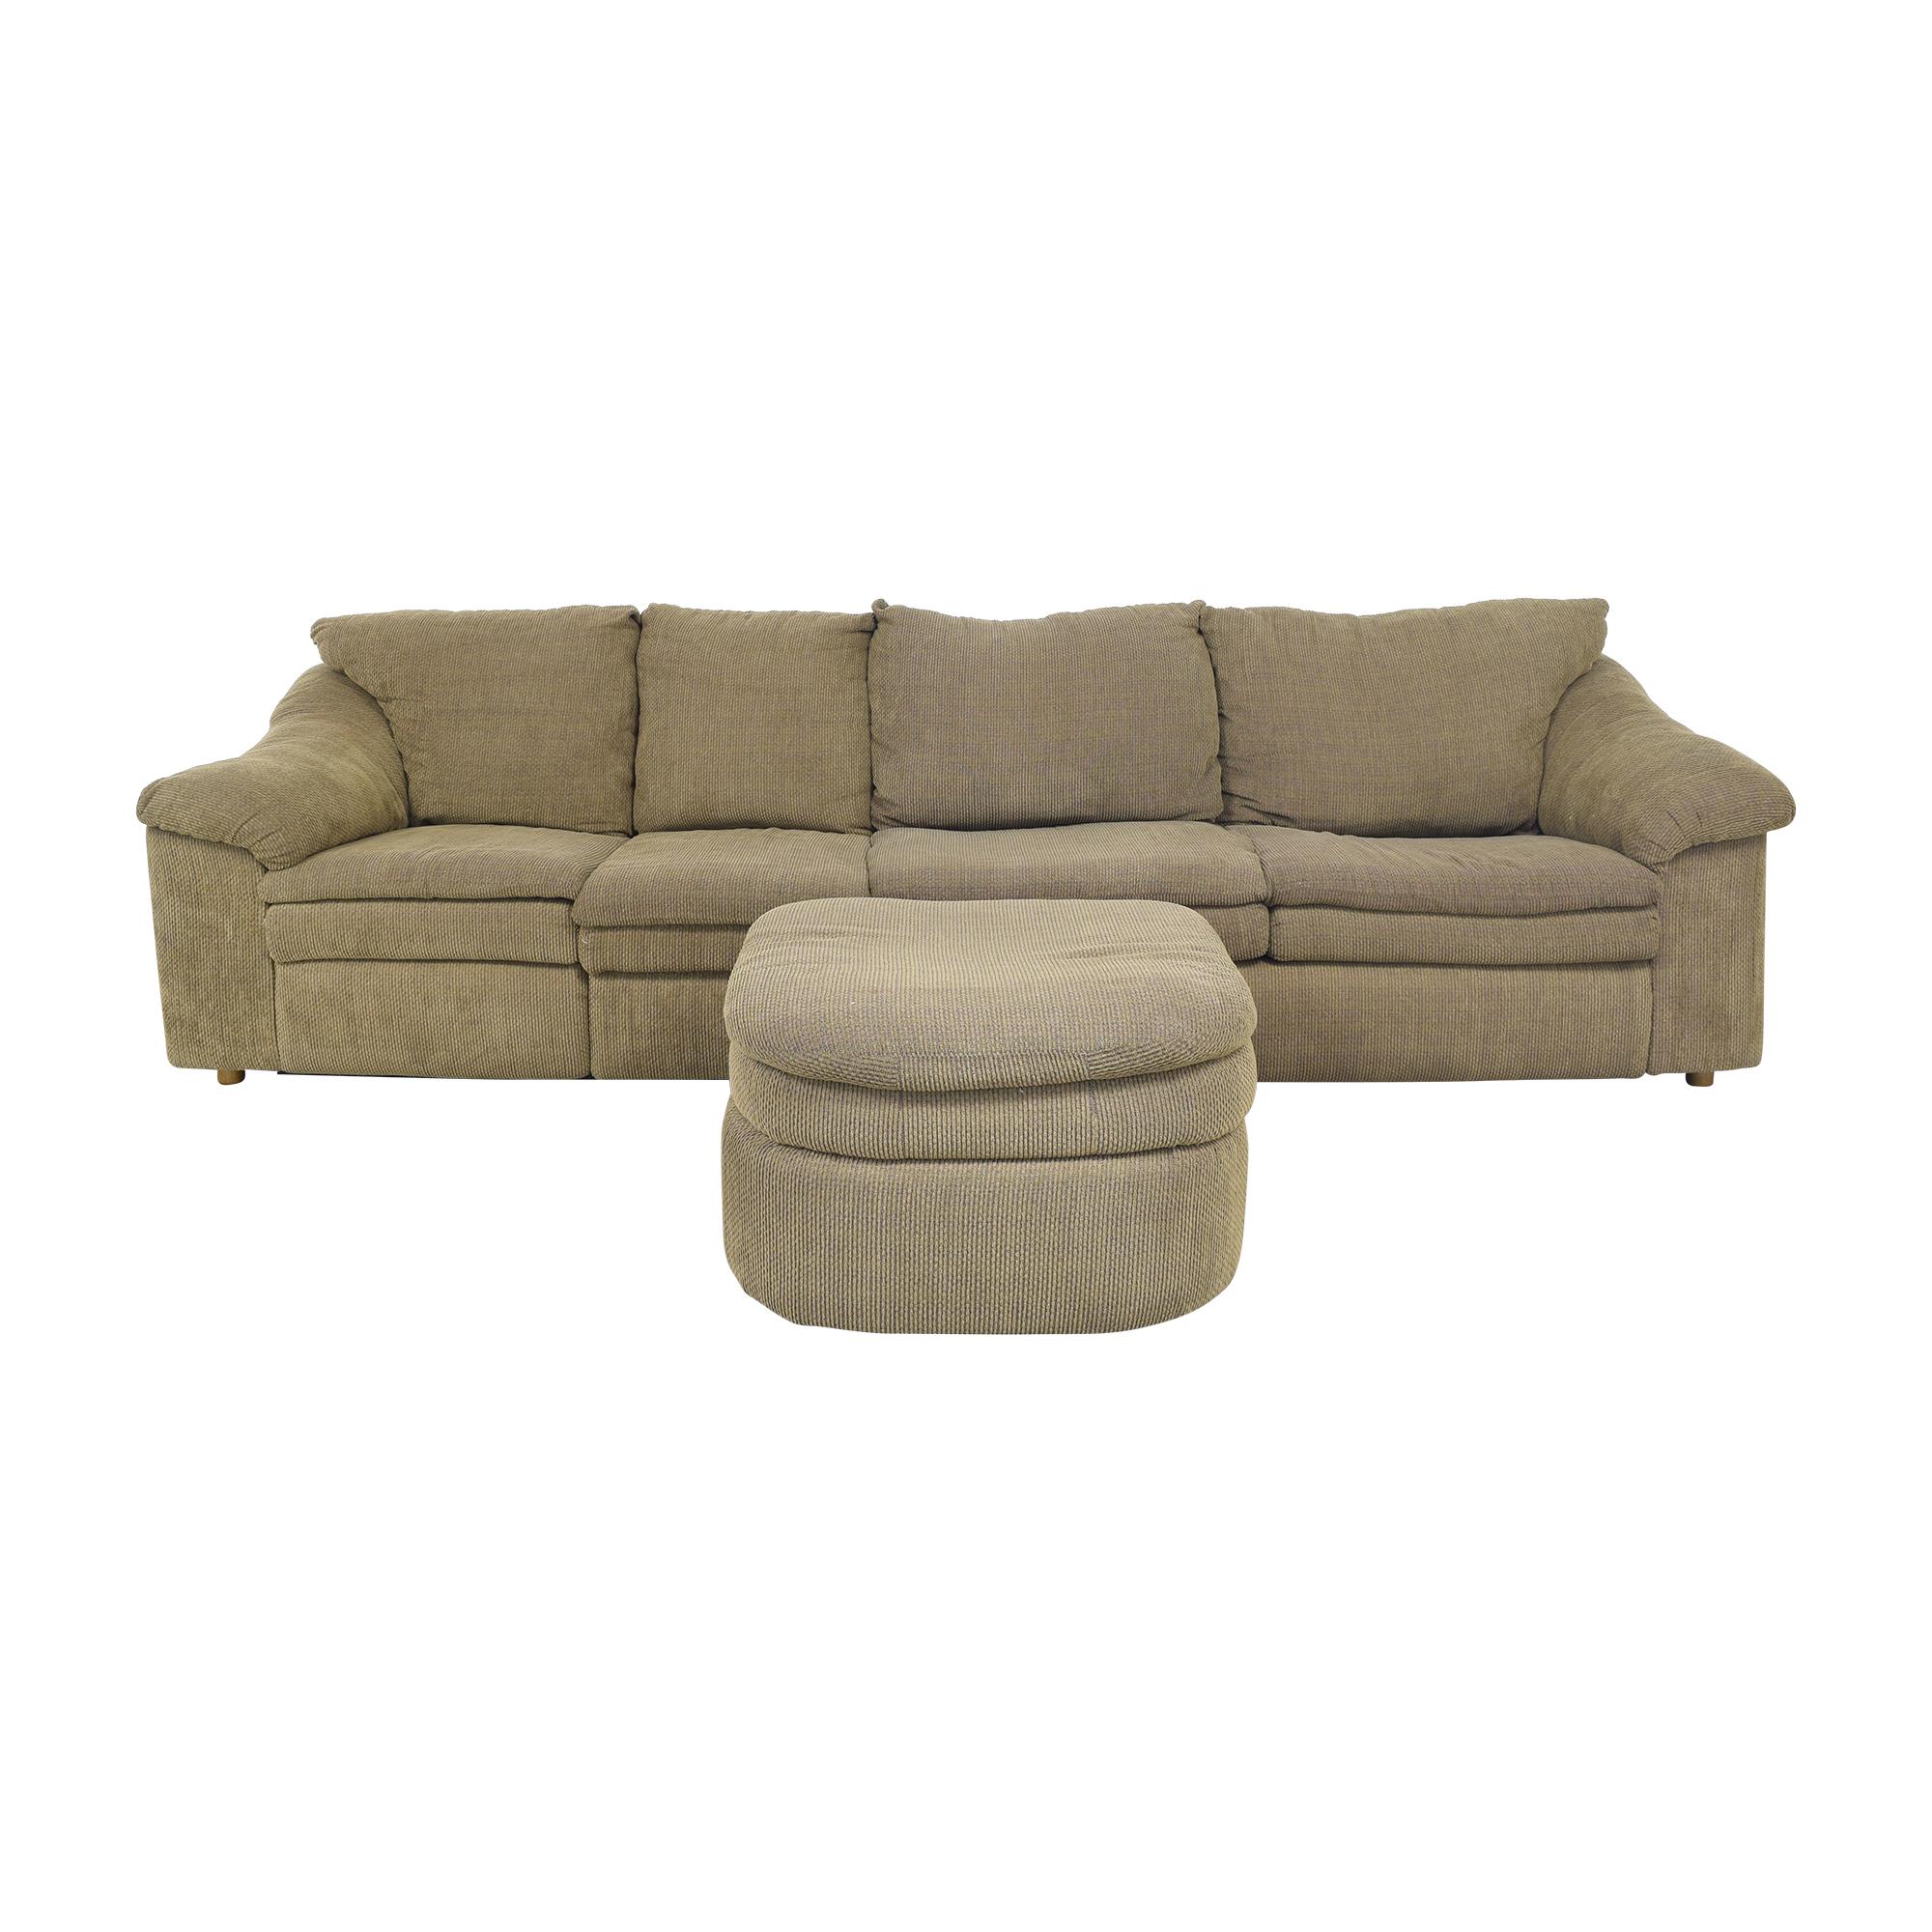 Raymour & Flanigan Raymour & Flanigan Sleeper Sofa with Ottoman for sale